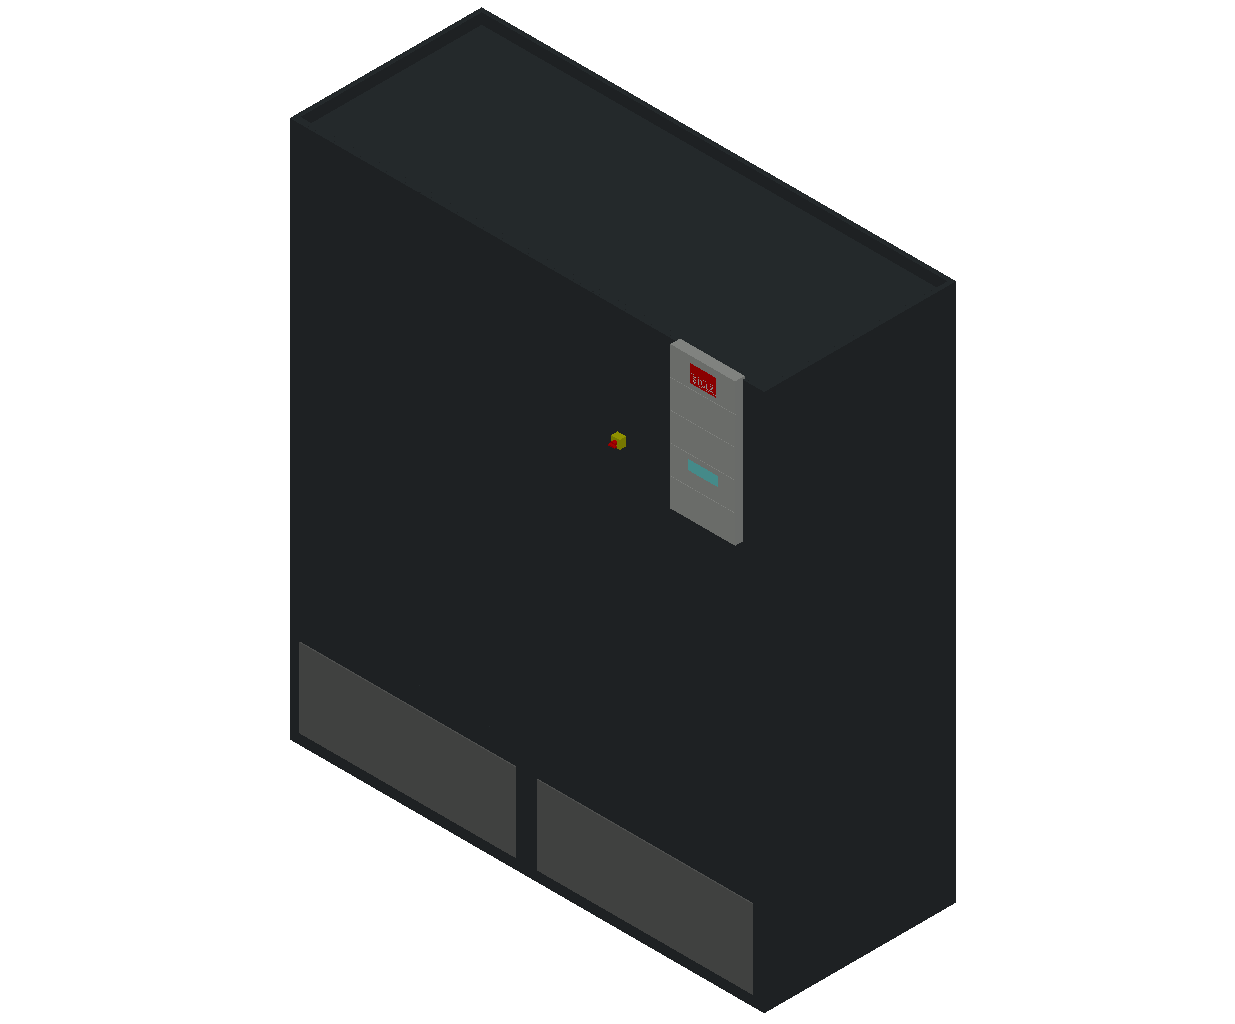 HC_Air Conditioner_Indoor Unit_MEPcontent_STULZ_CyberAir 3PRO_ASR_CW2_ASR_1080_CW2_INT-EN.dwg